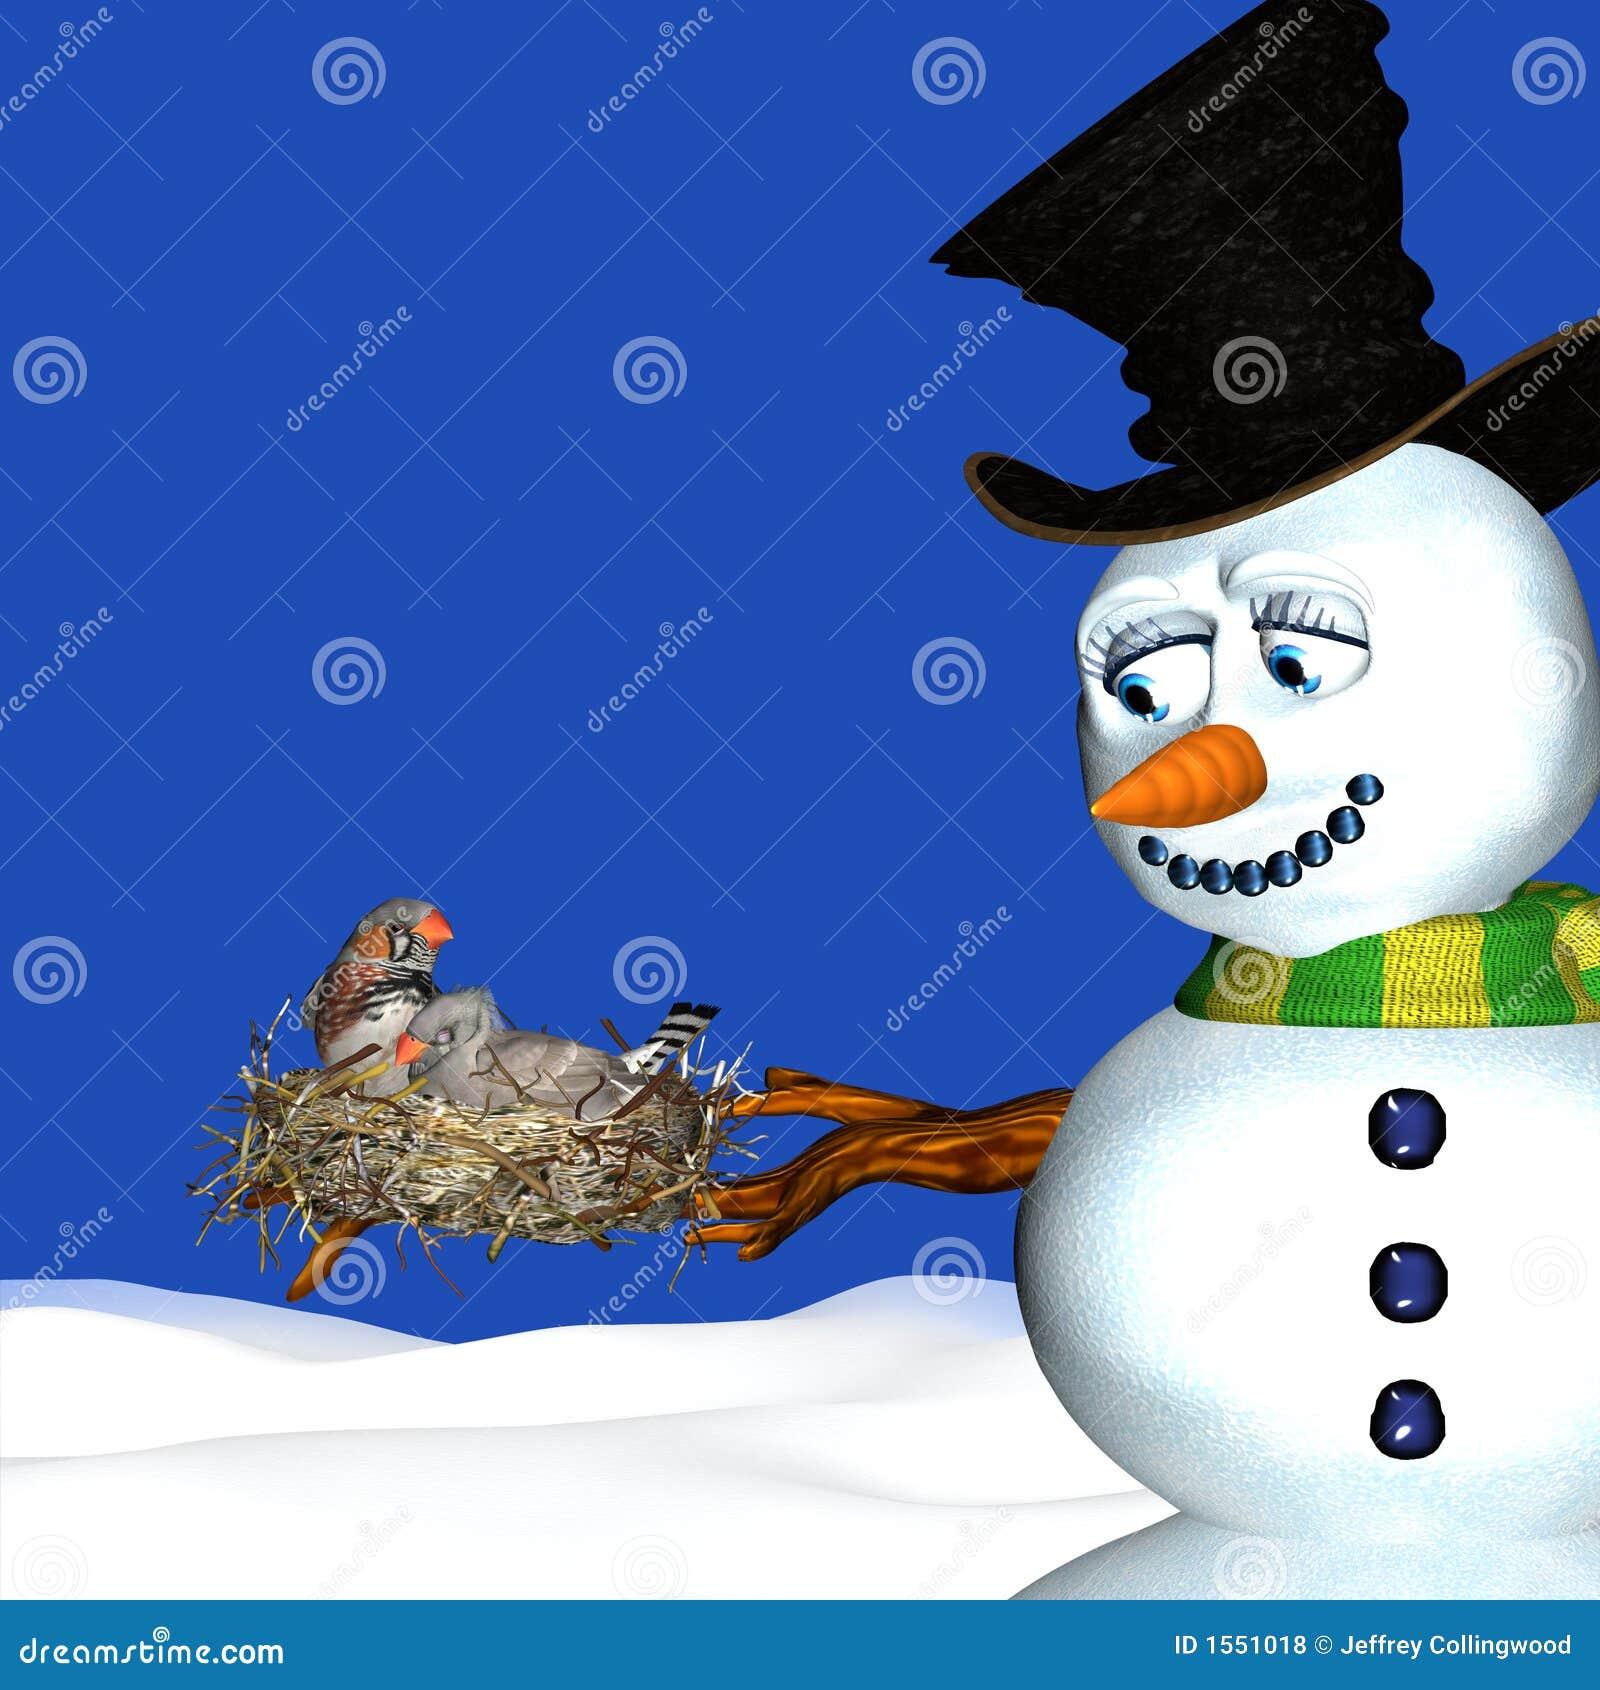 Snowman and Birds Nesting